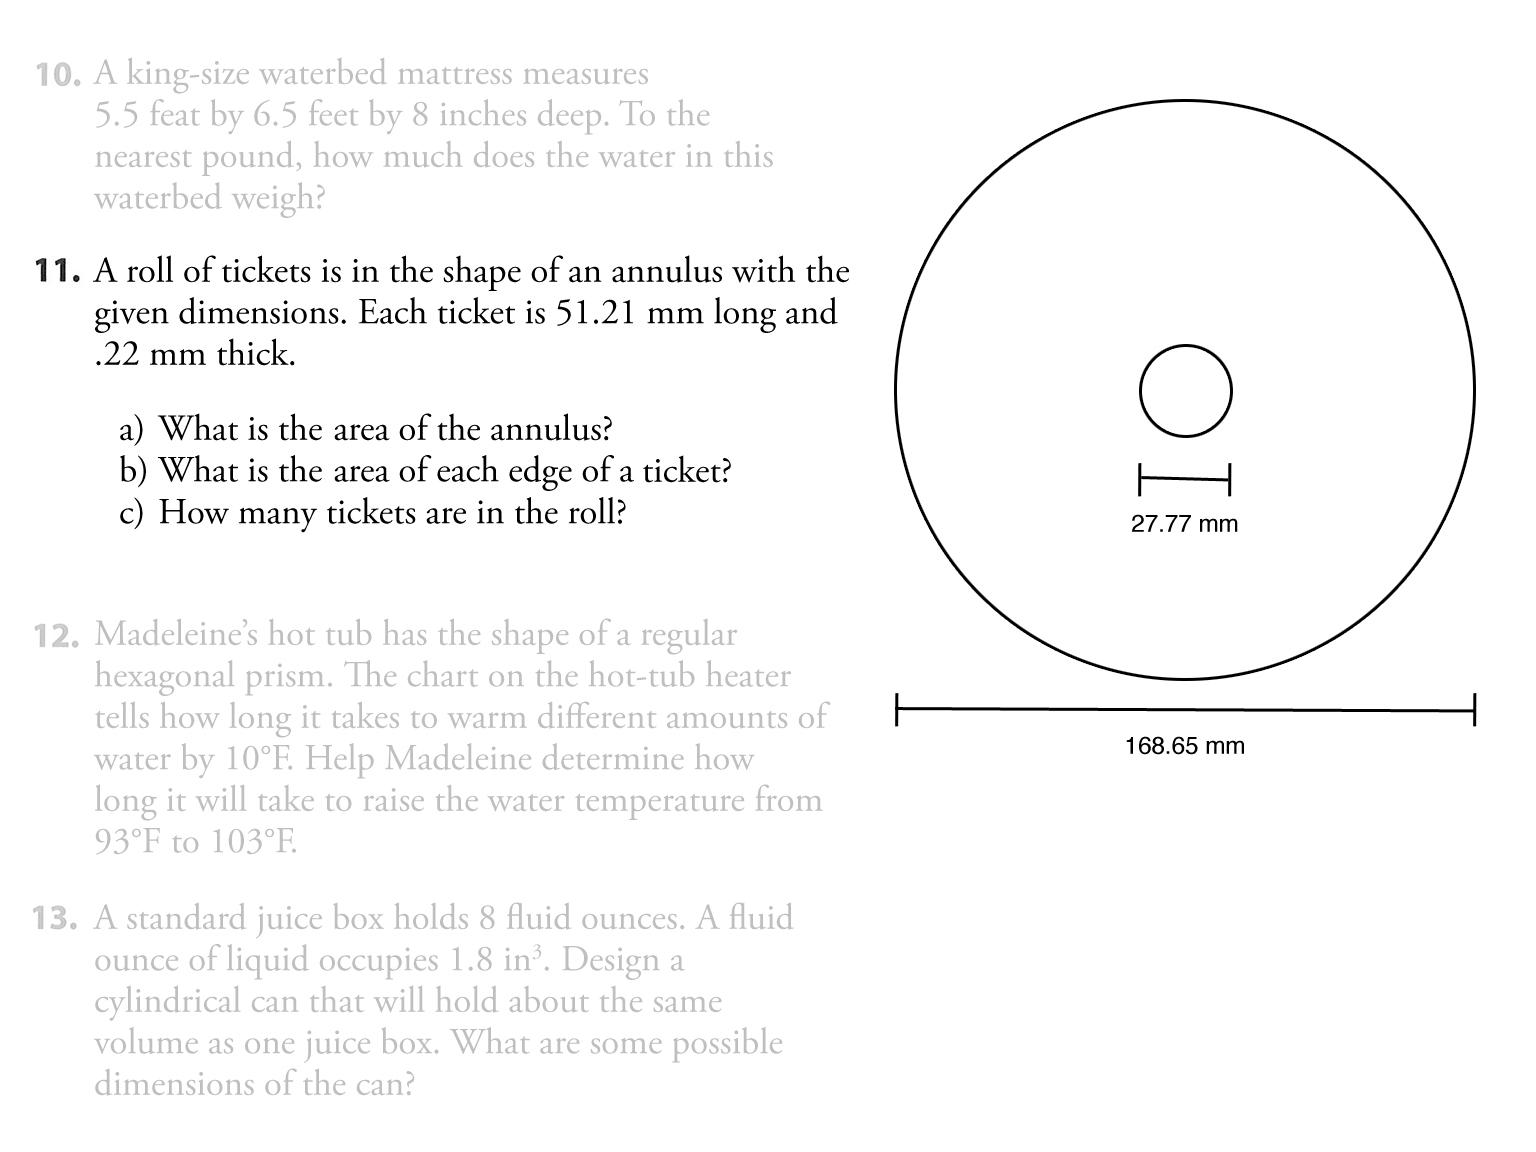 Basic math practice problems